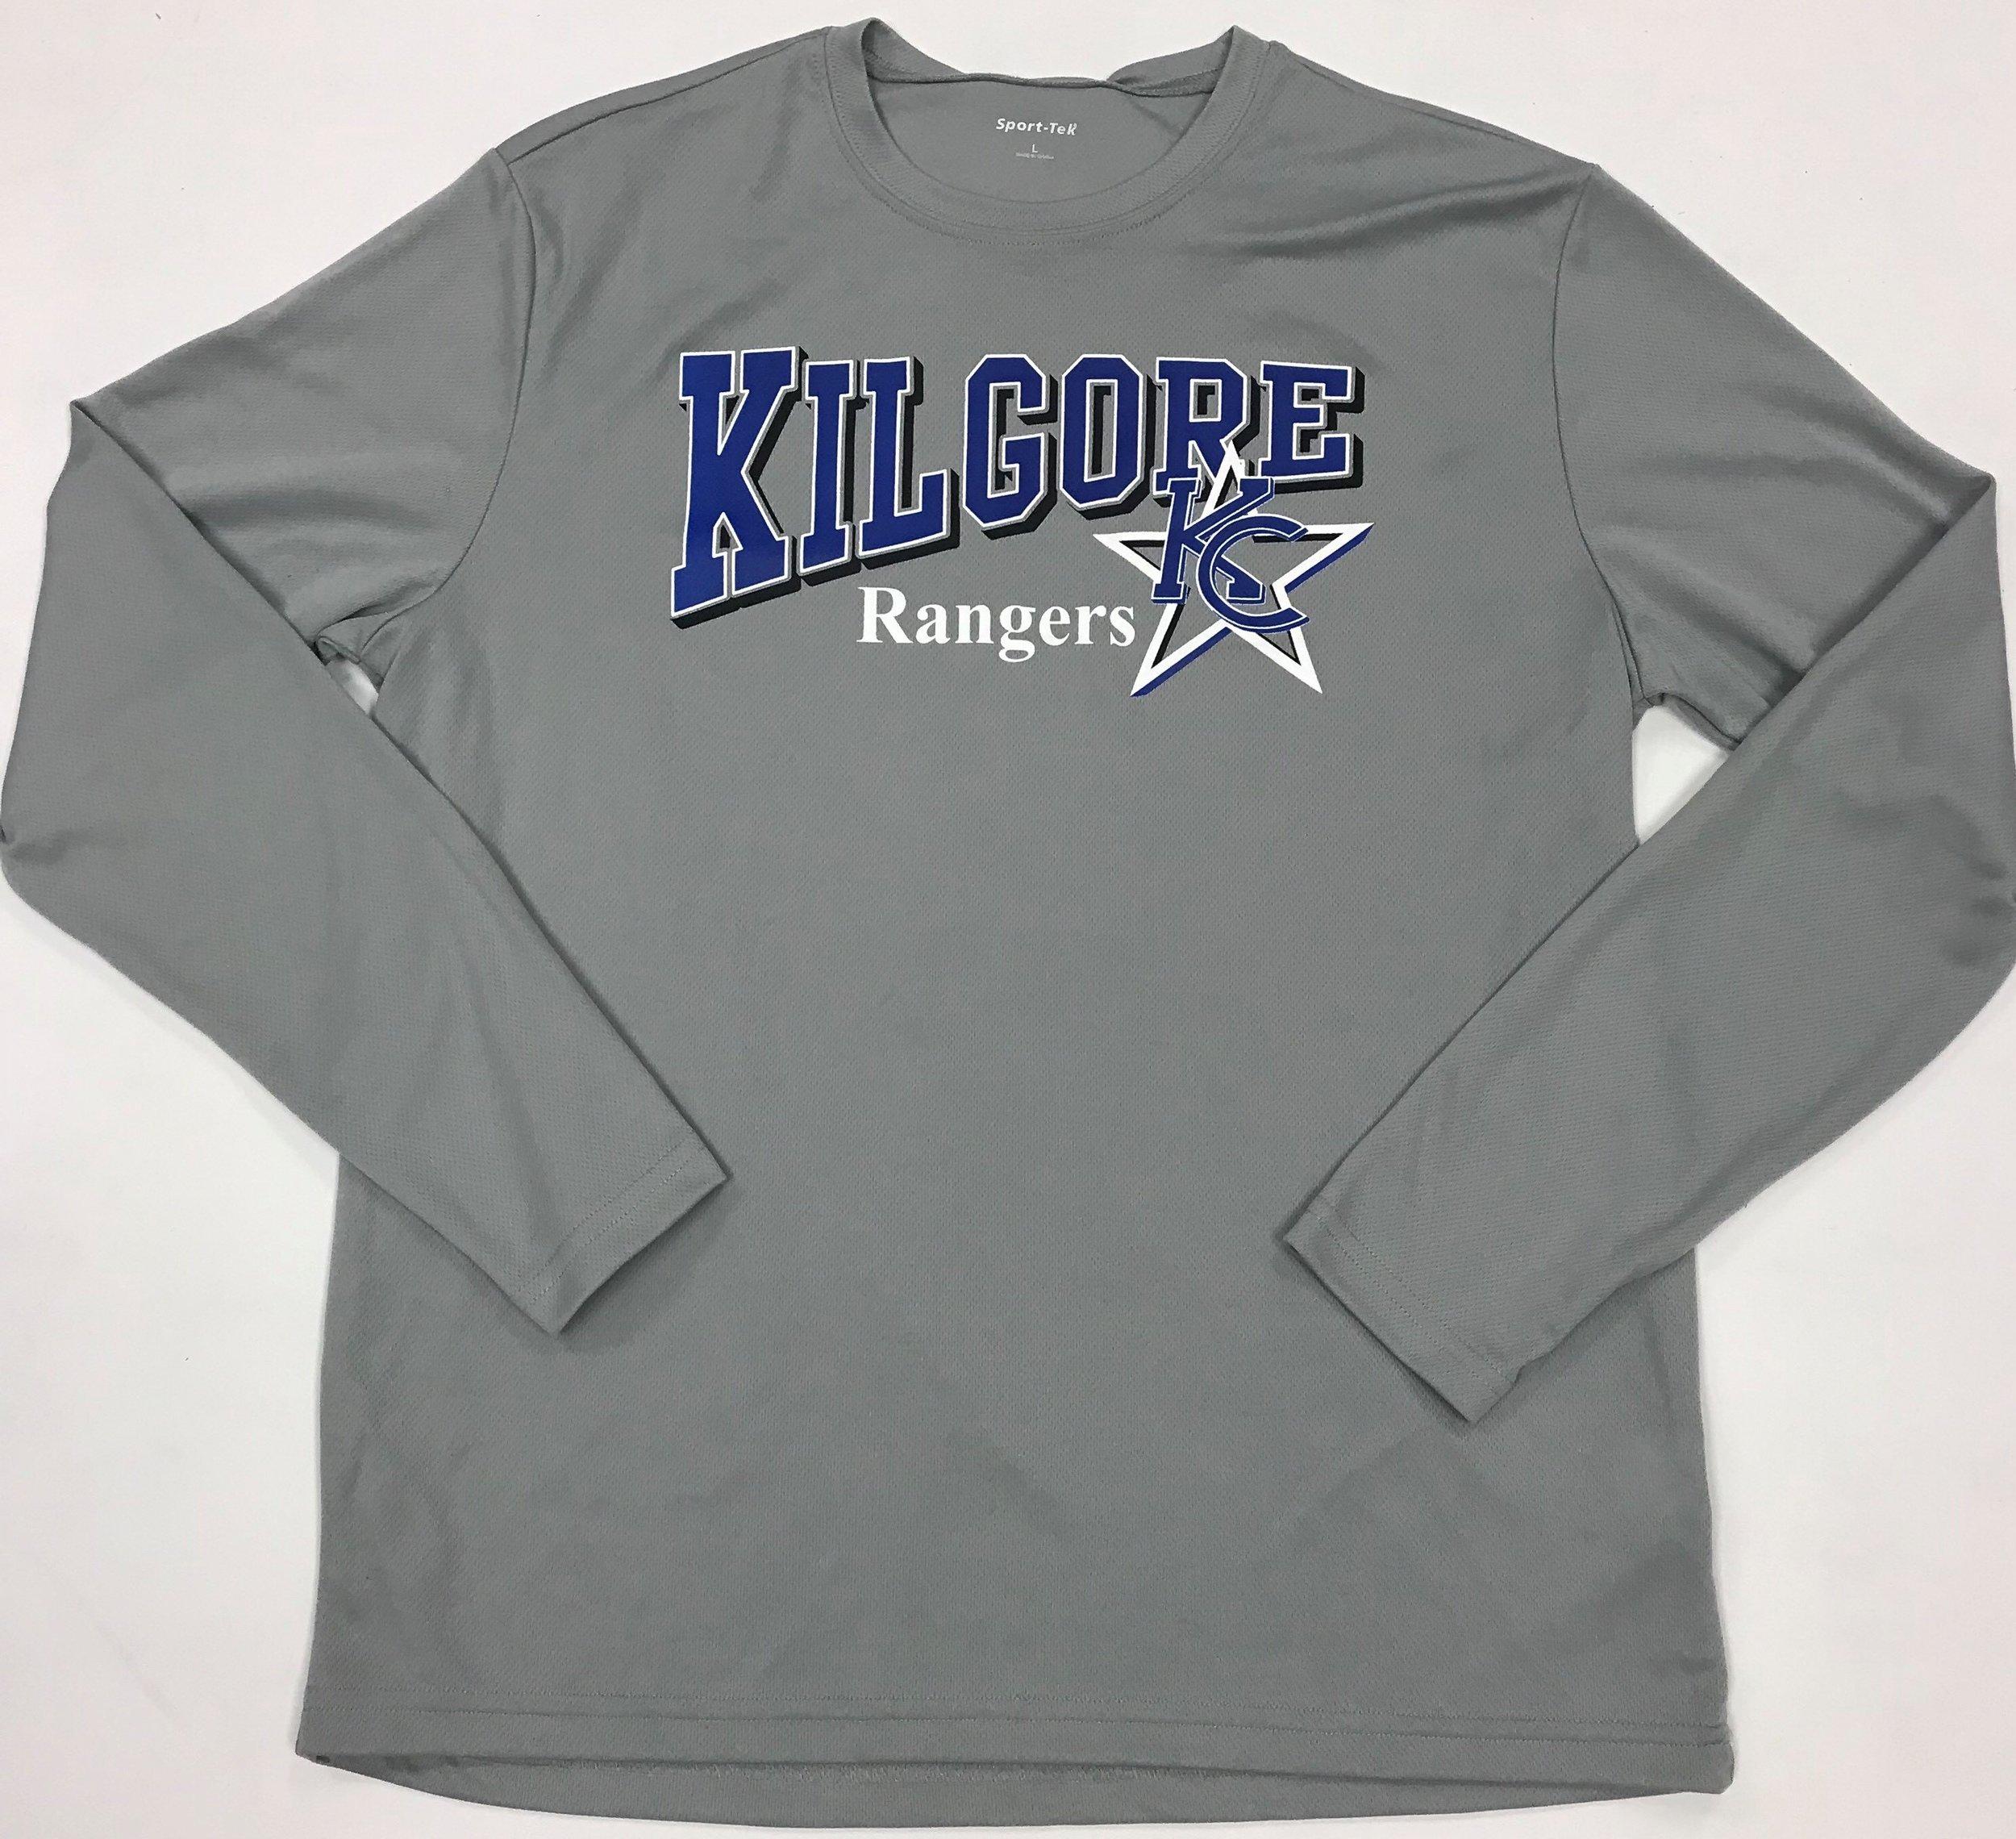 Kilgore Rangers.jpg